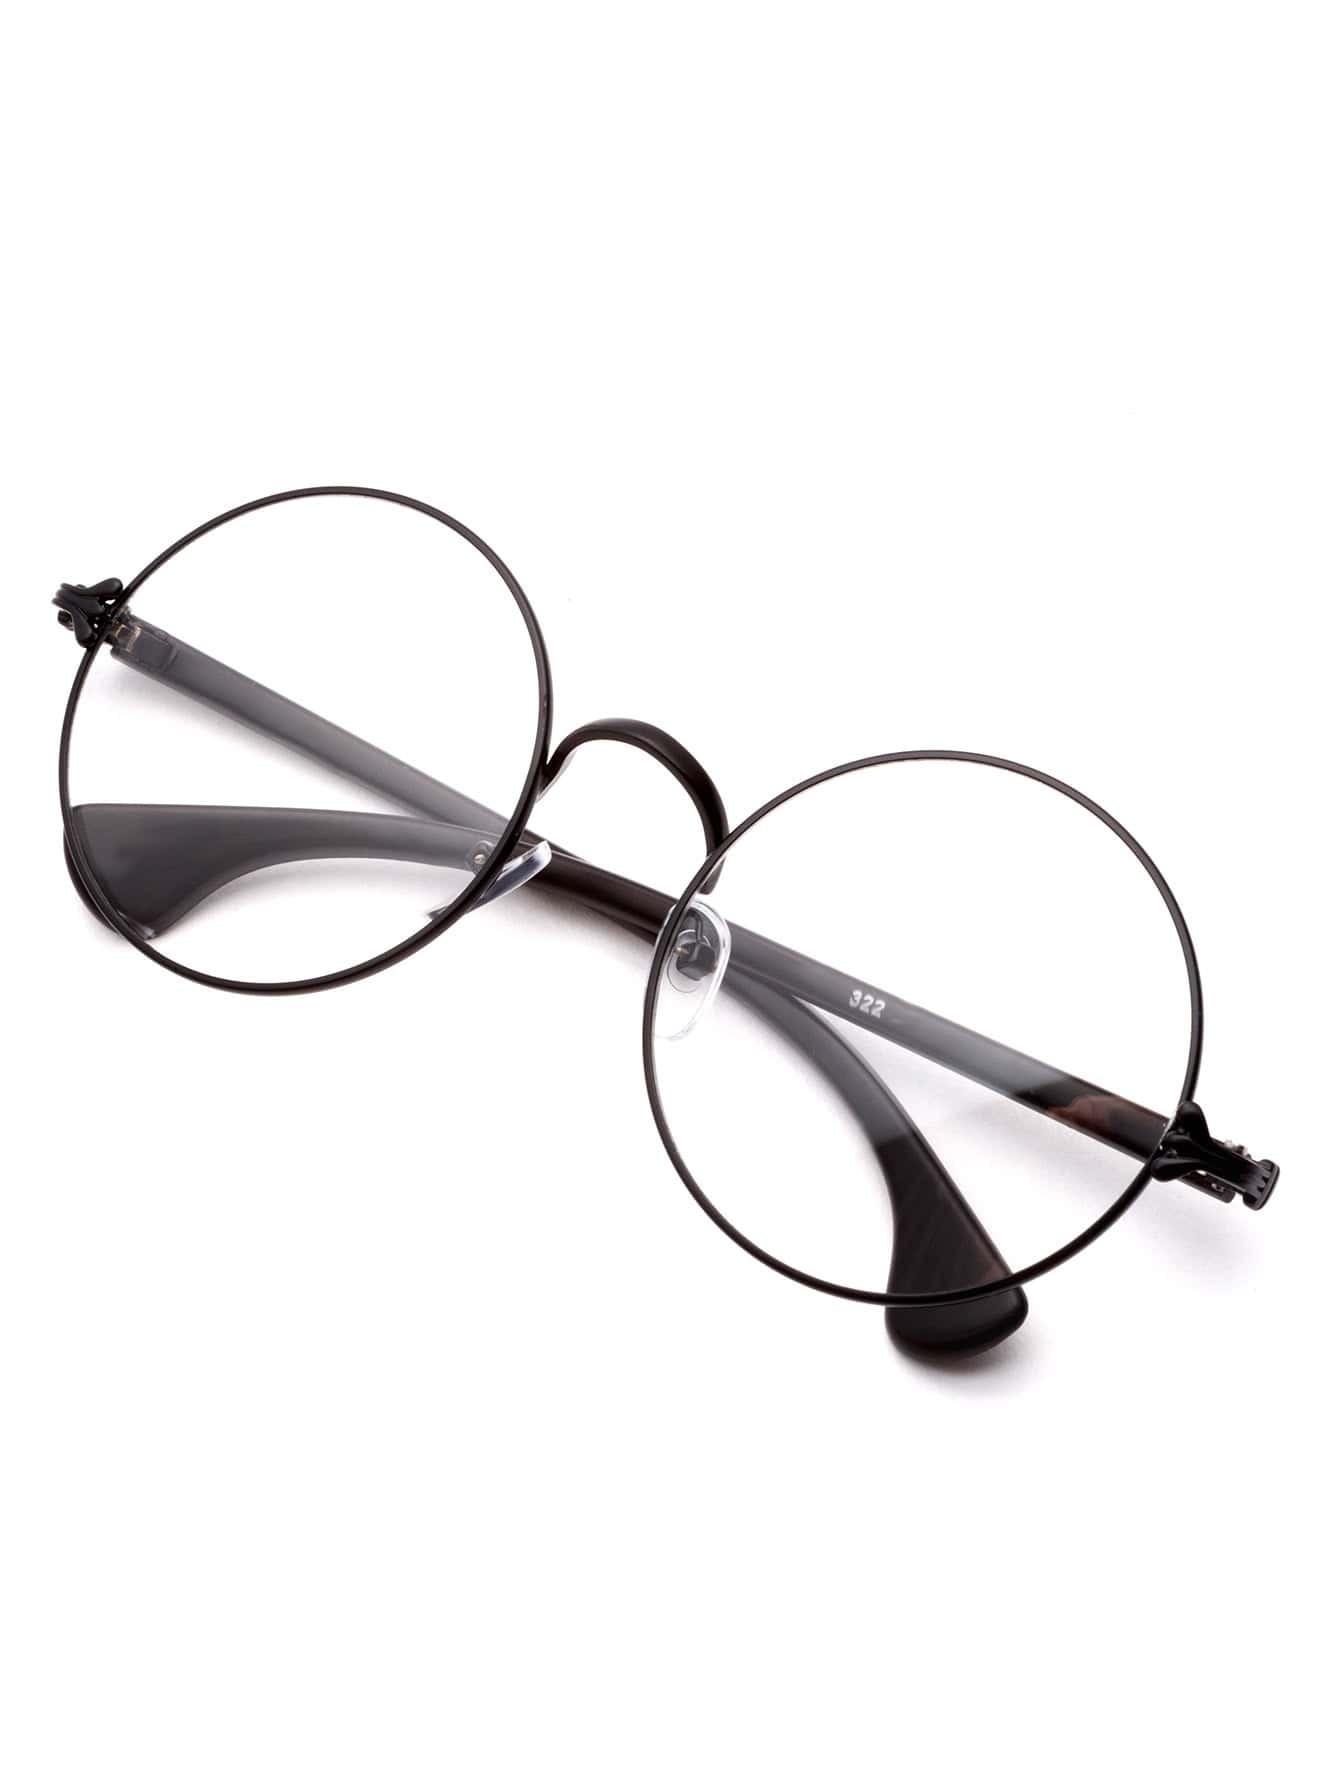 Matte Black Frame Clear Lens Glasses